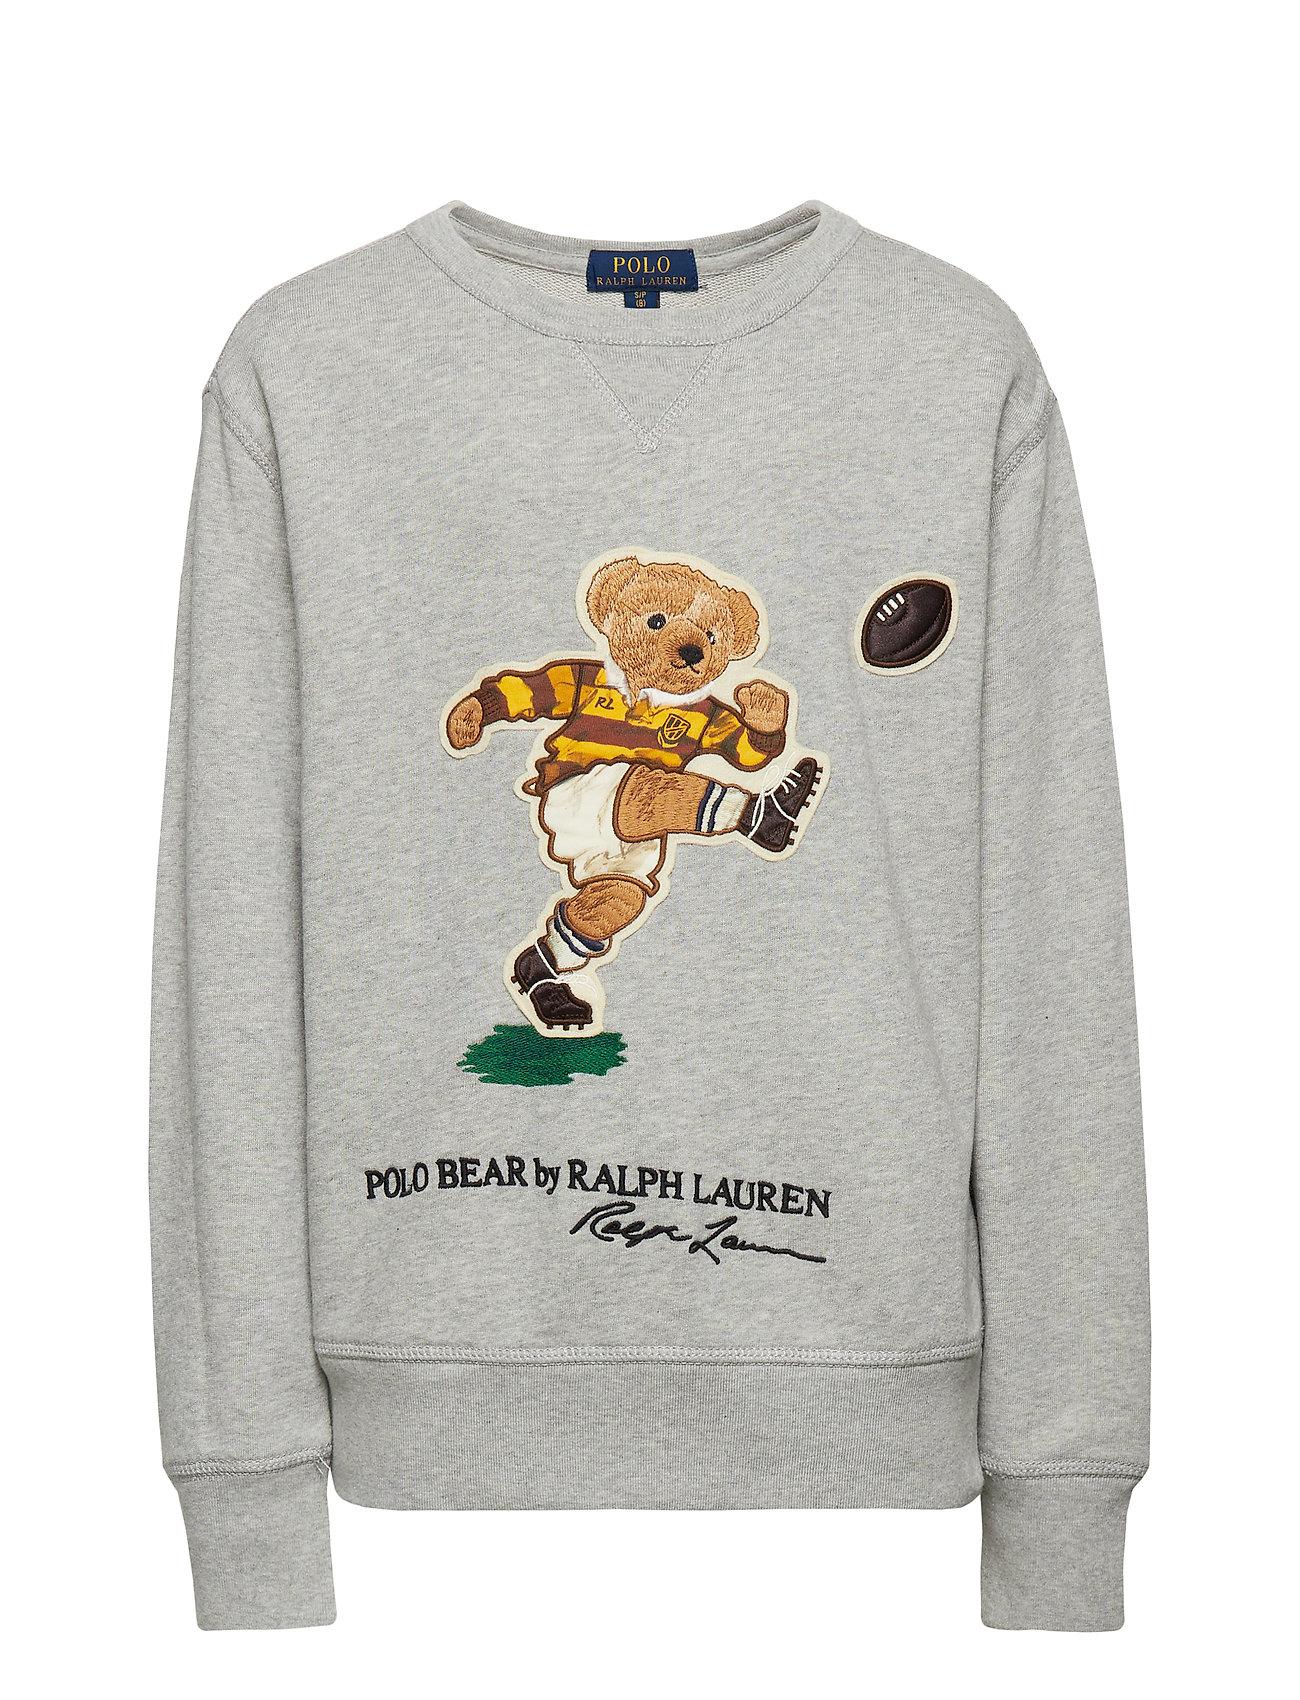 Ralph Lauren Kids Rugby Bear Cotton Sweatshirt - LT GREY HEATHER